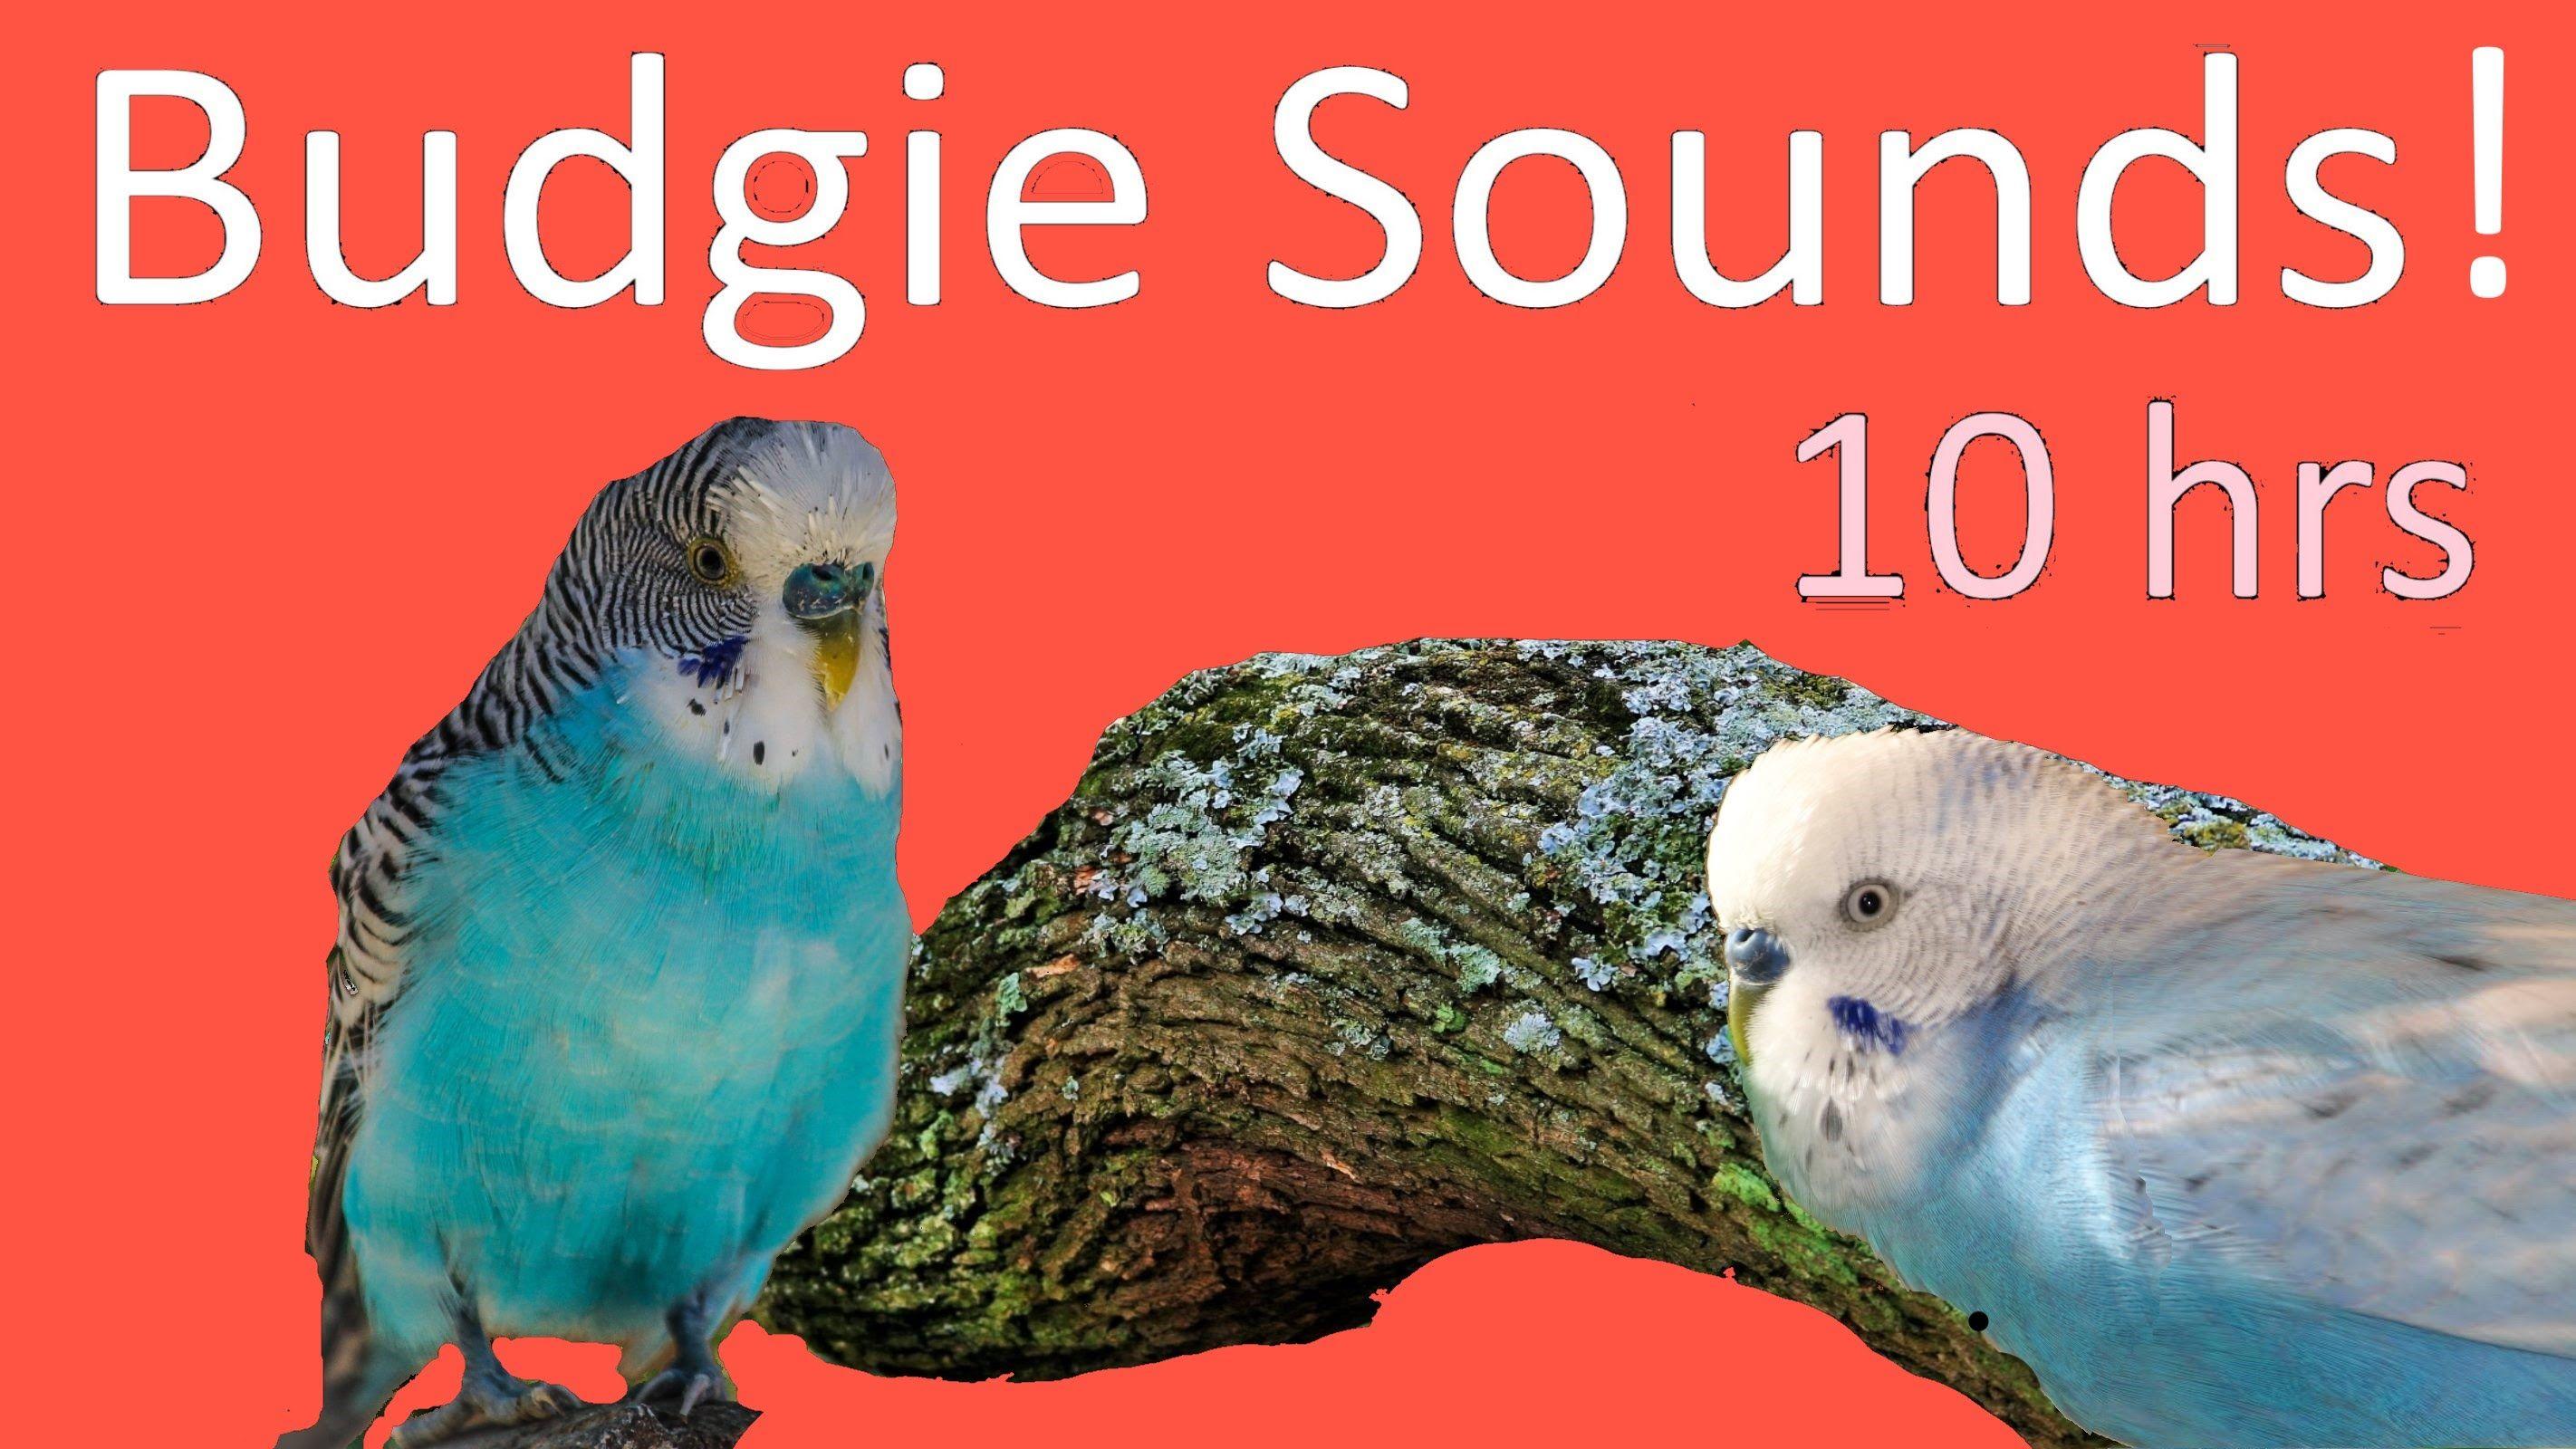 Budgie sounds (10 hrs) | Birds | Budgies, Parakeet, Animals